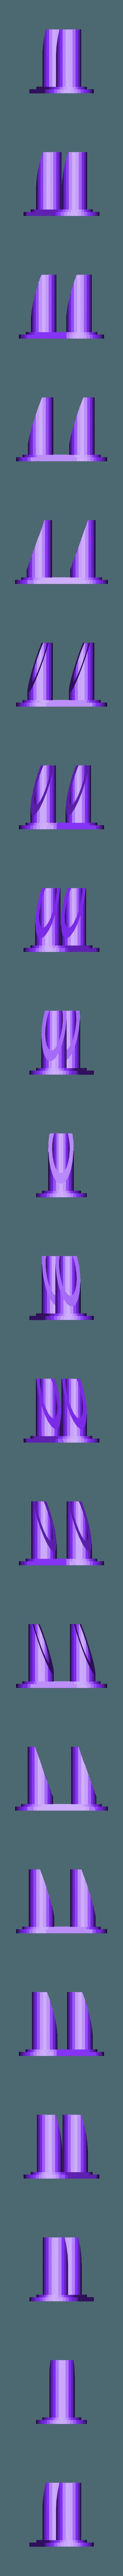 Visiere_2F.STL Download STL file Square signal Purple • Object to 3D print, dede34500